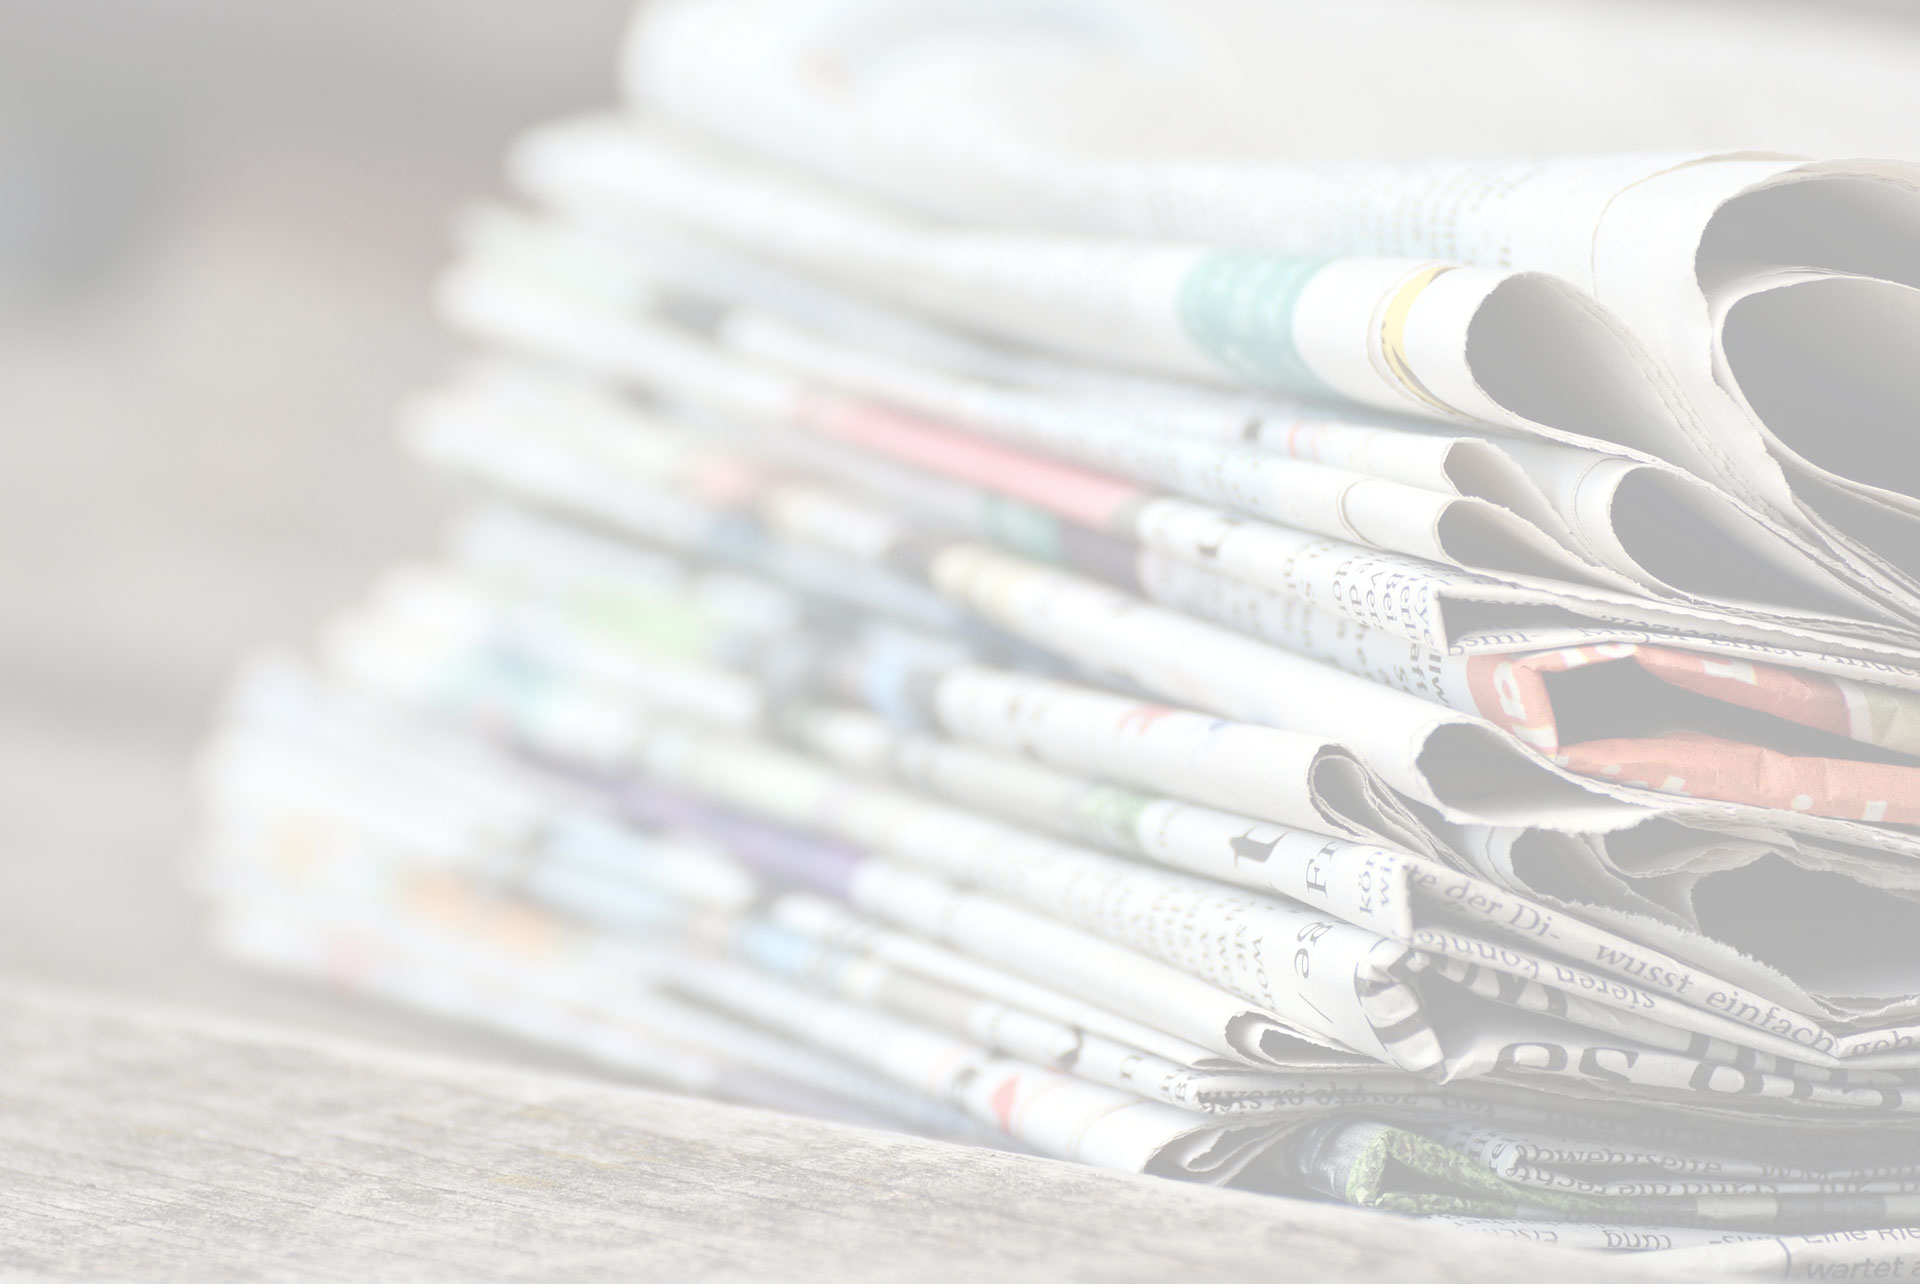 Linda Grassucci